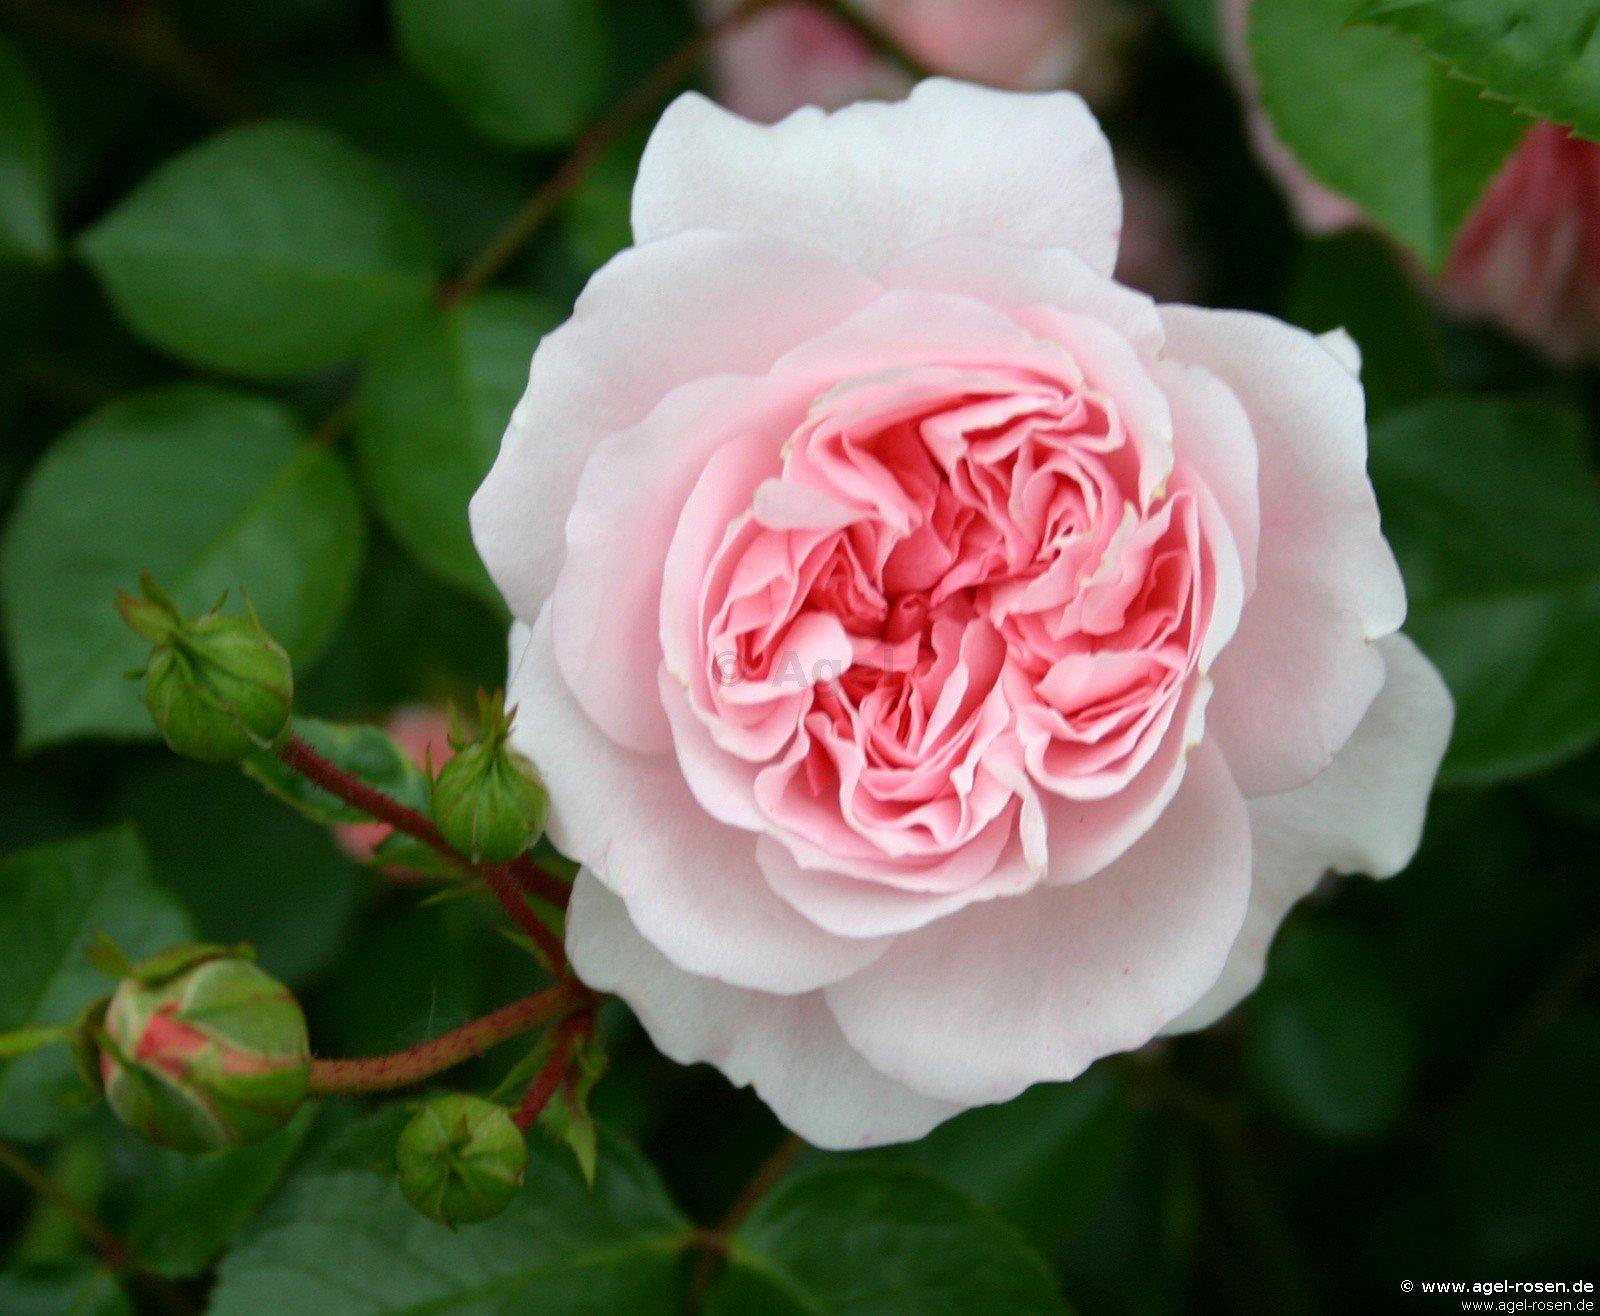 Dévouée teen granny square handmade pink reminds